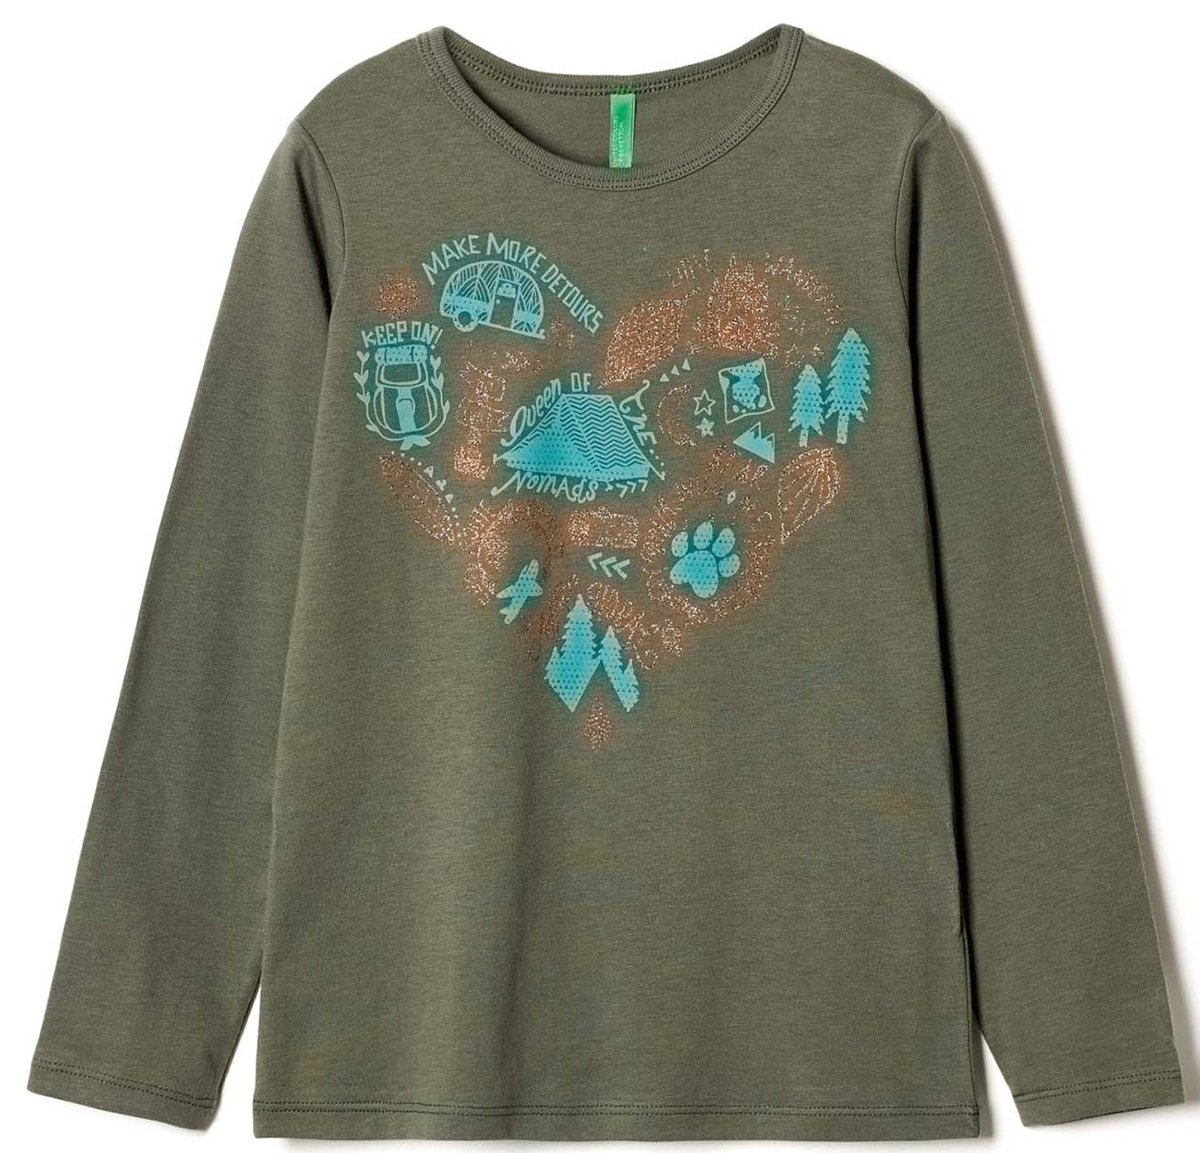 Фото Лонгслив для девочки United Colors of Benetton, цвет: зеленый. 3I1XC139V_12G. Размер 150